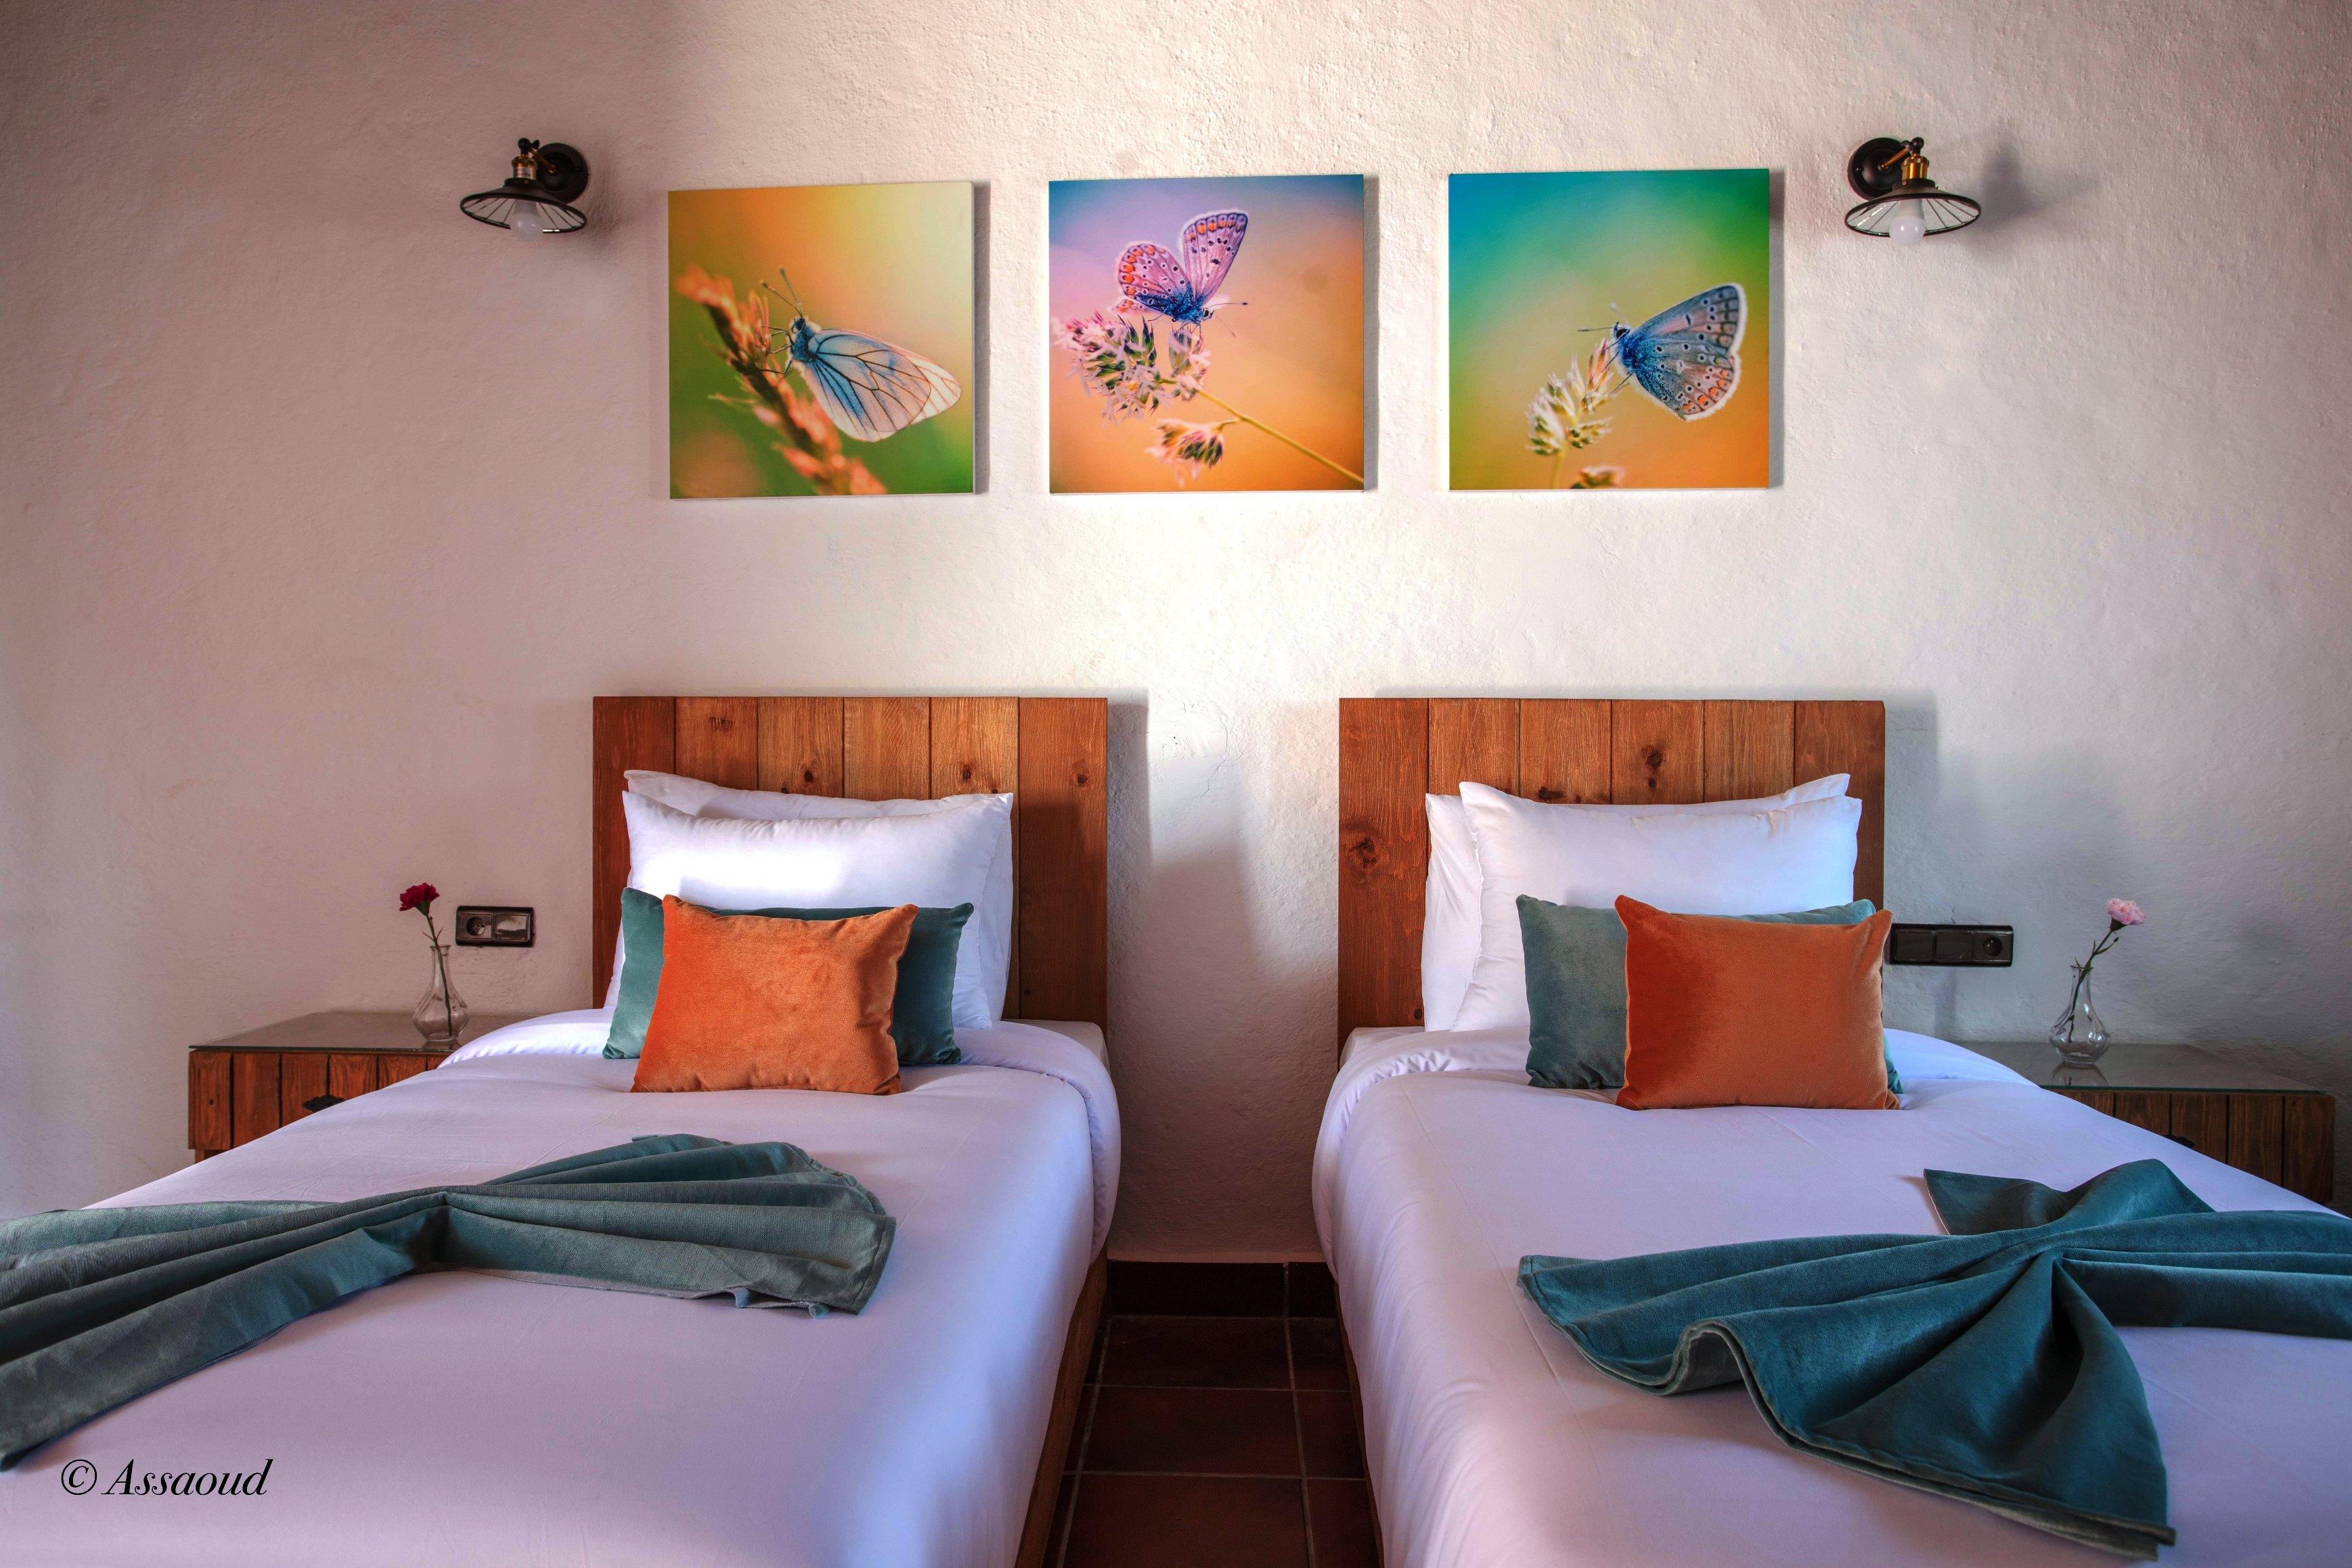 Bungalow Doppel 15 - El Cortijo Chefchaeun Hotel S  in Marokko